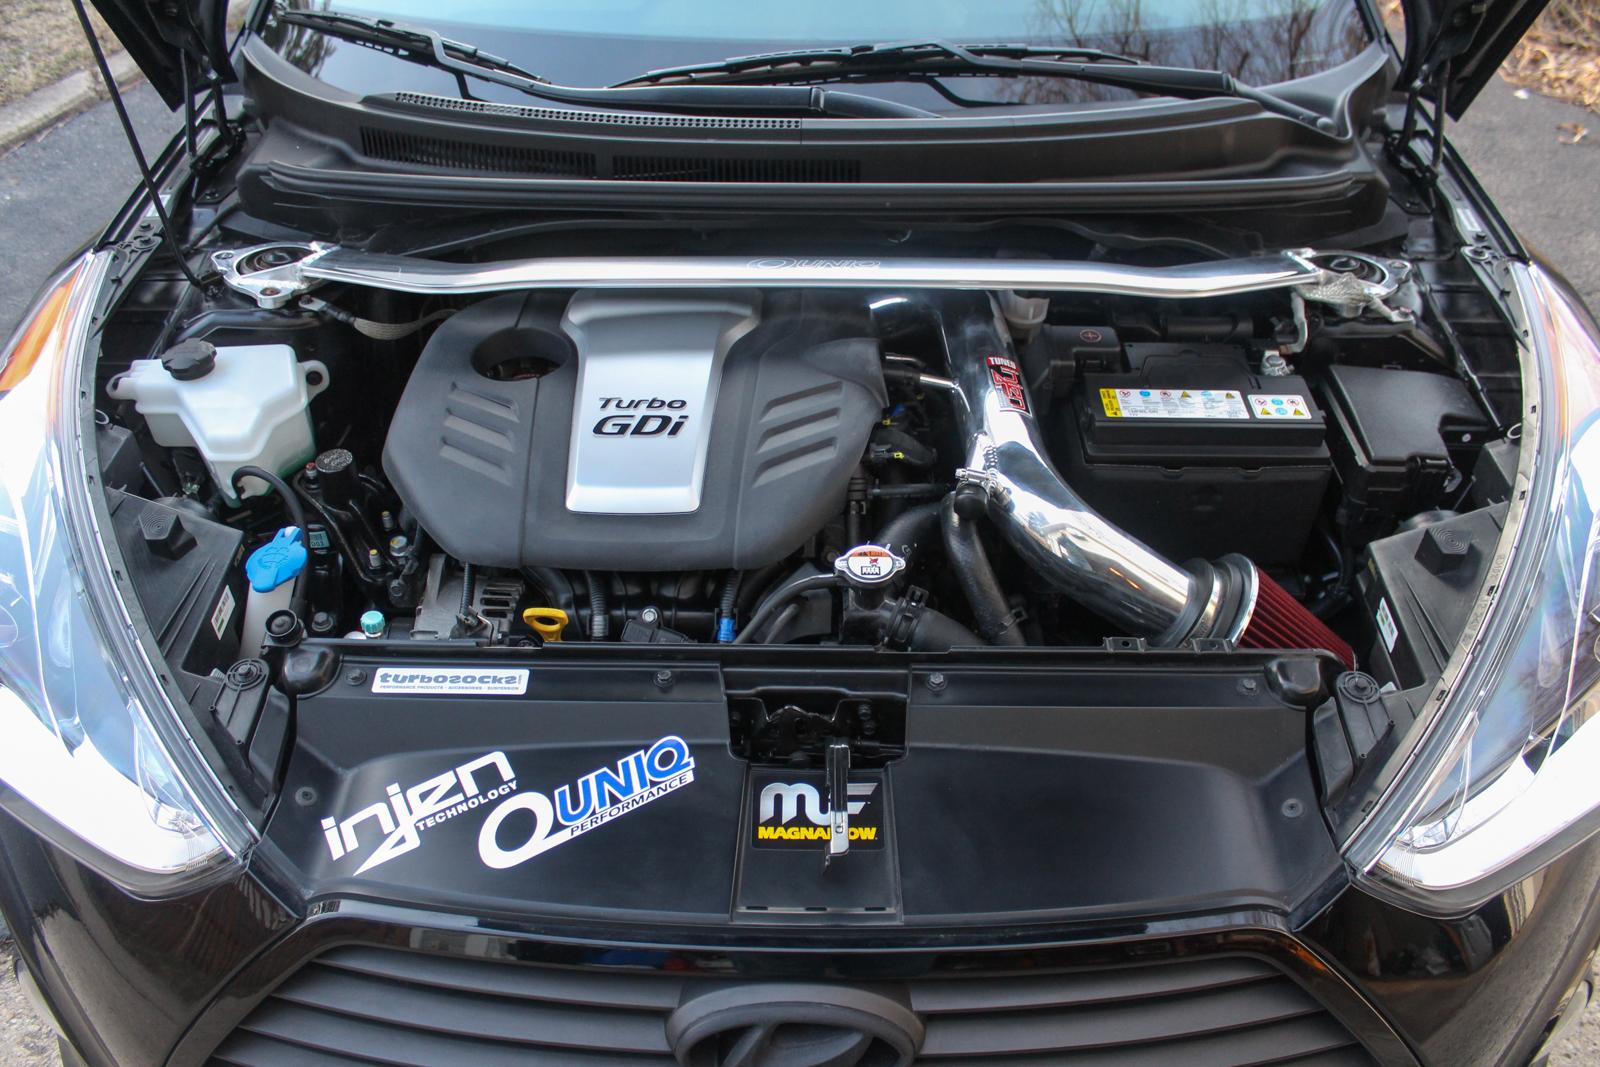 Yeshavesomes 2013 Veloster Turbo Base M T Ultra Black Fuse Box 2008 Hyundai Elantra Name Img 3343 Views 533 Size 132 Mb